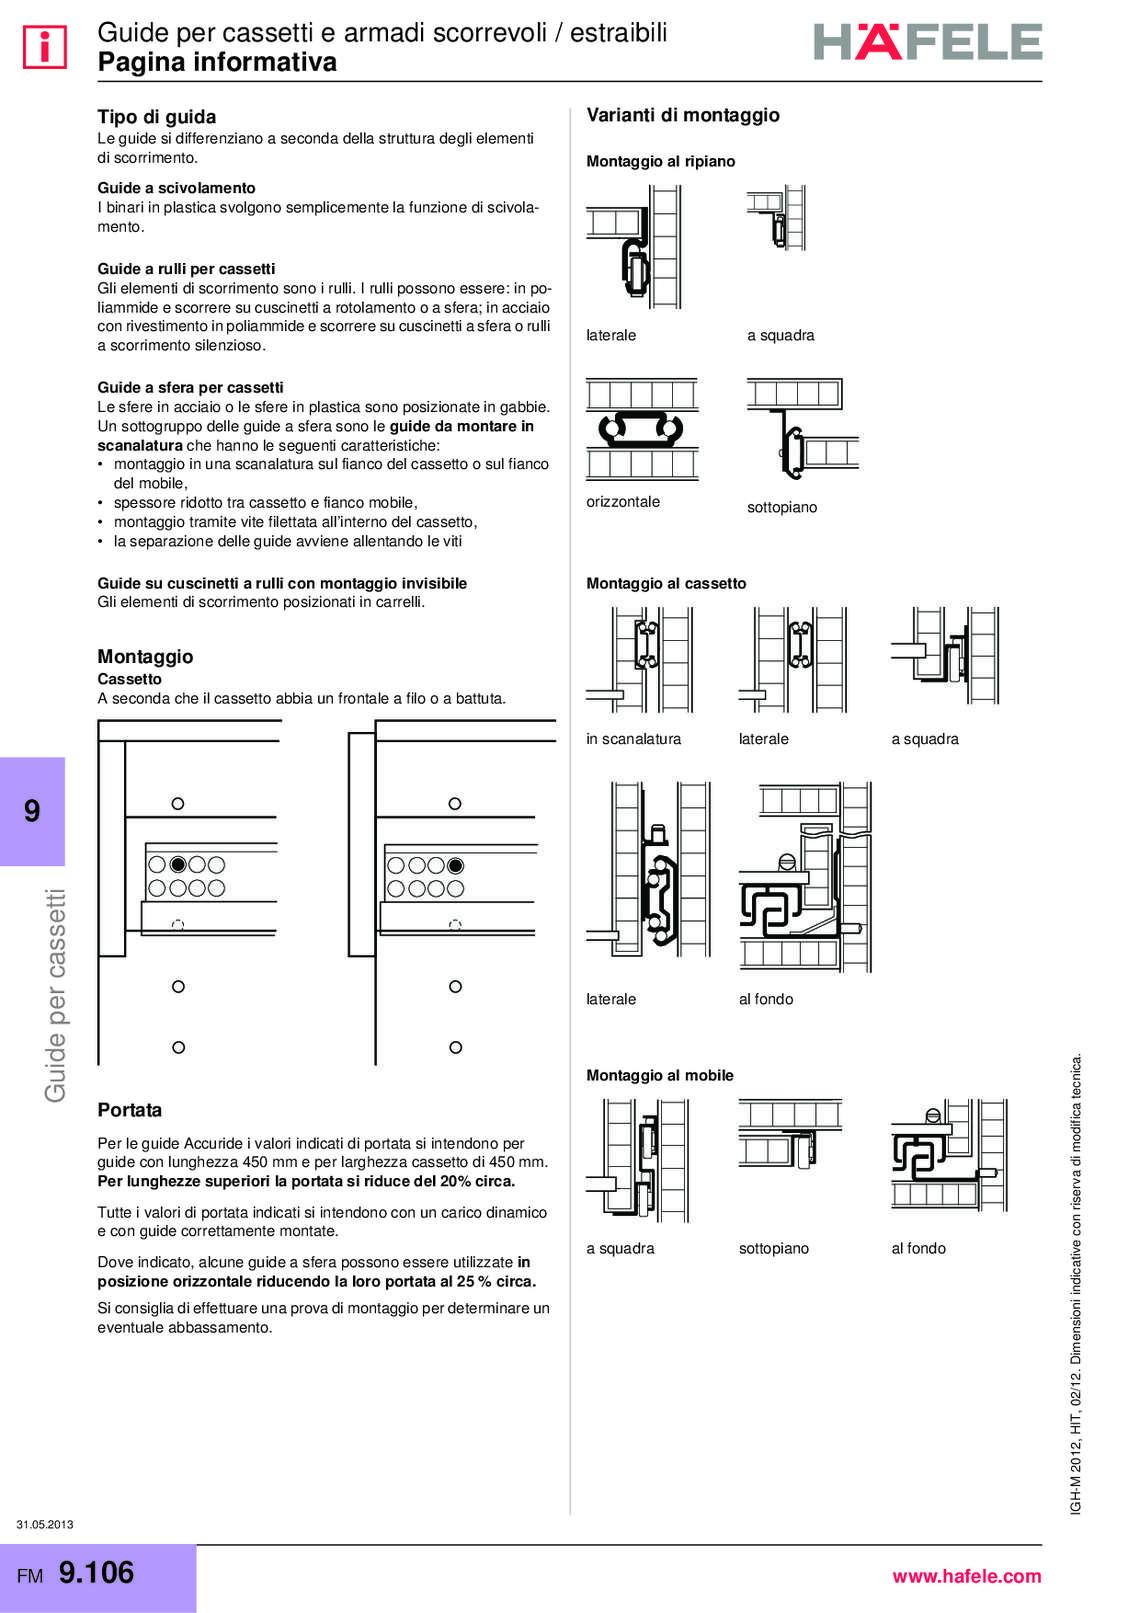 hafele-spondine-e-guide-per-mobili_40_153.jpg